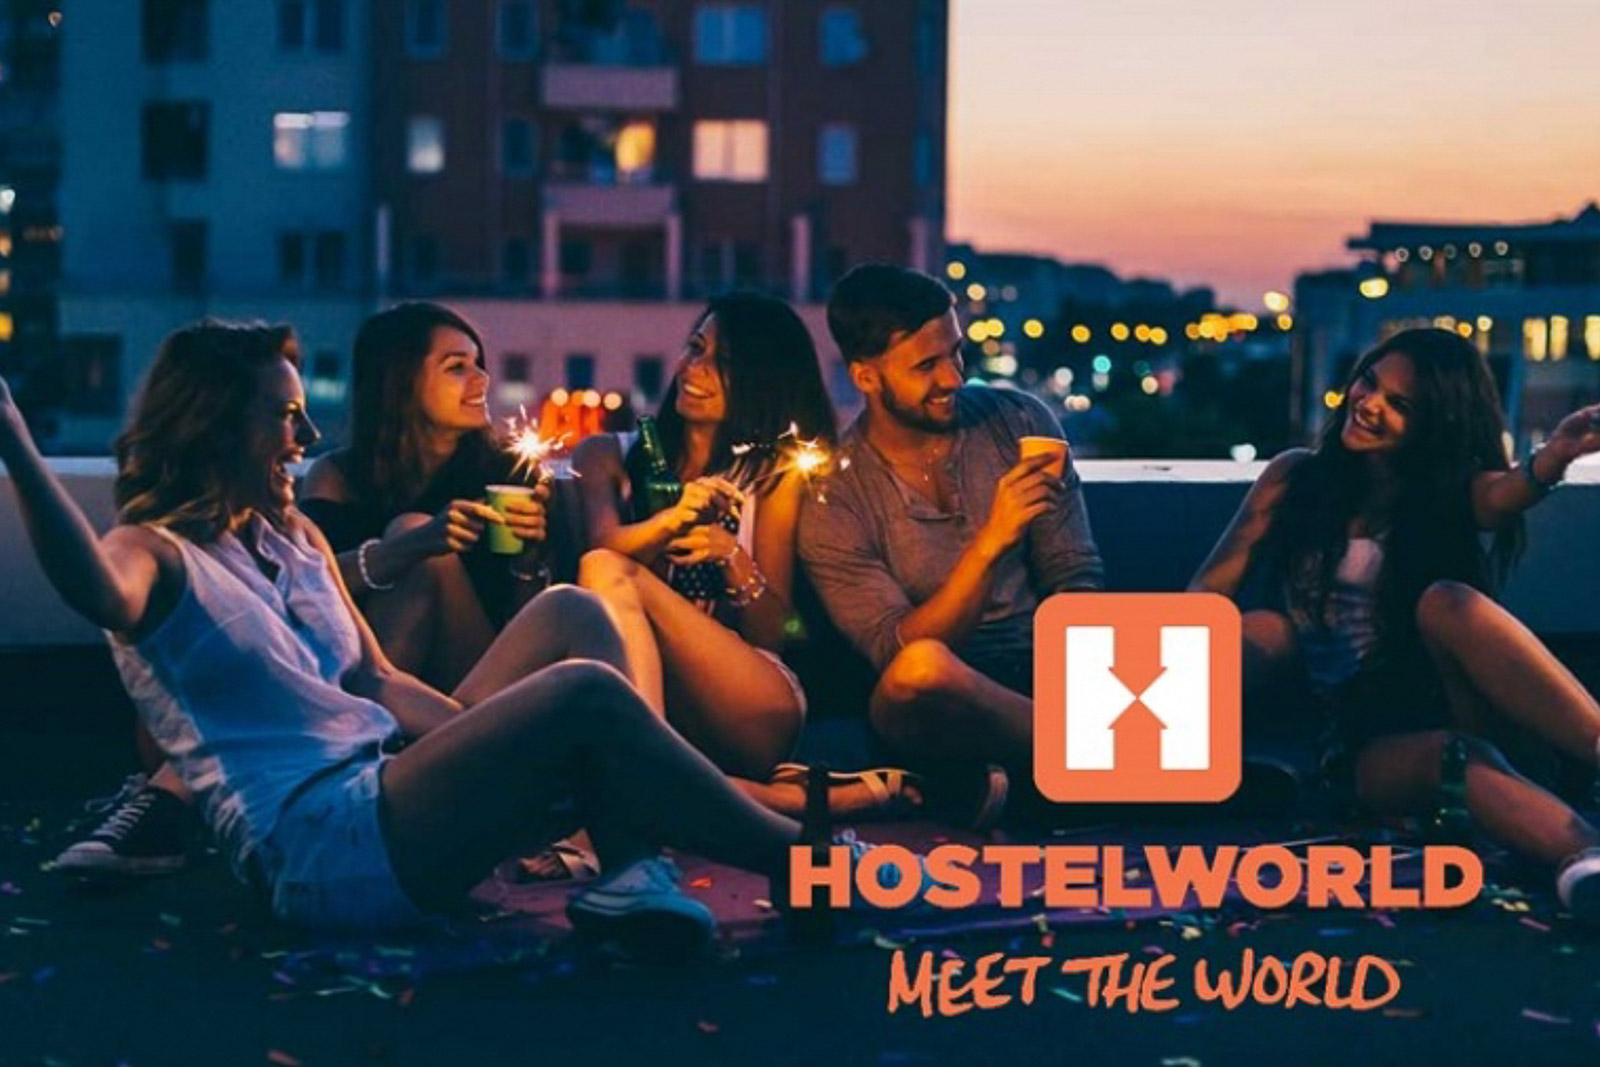 Hostelworld, viajar simples e barato_Num Postal